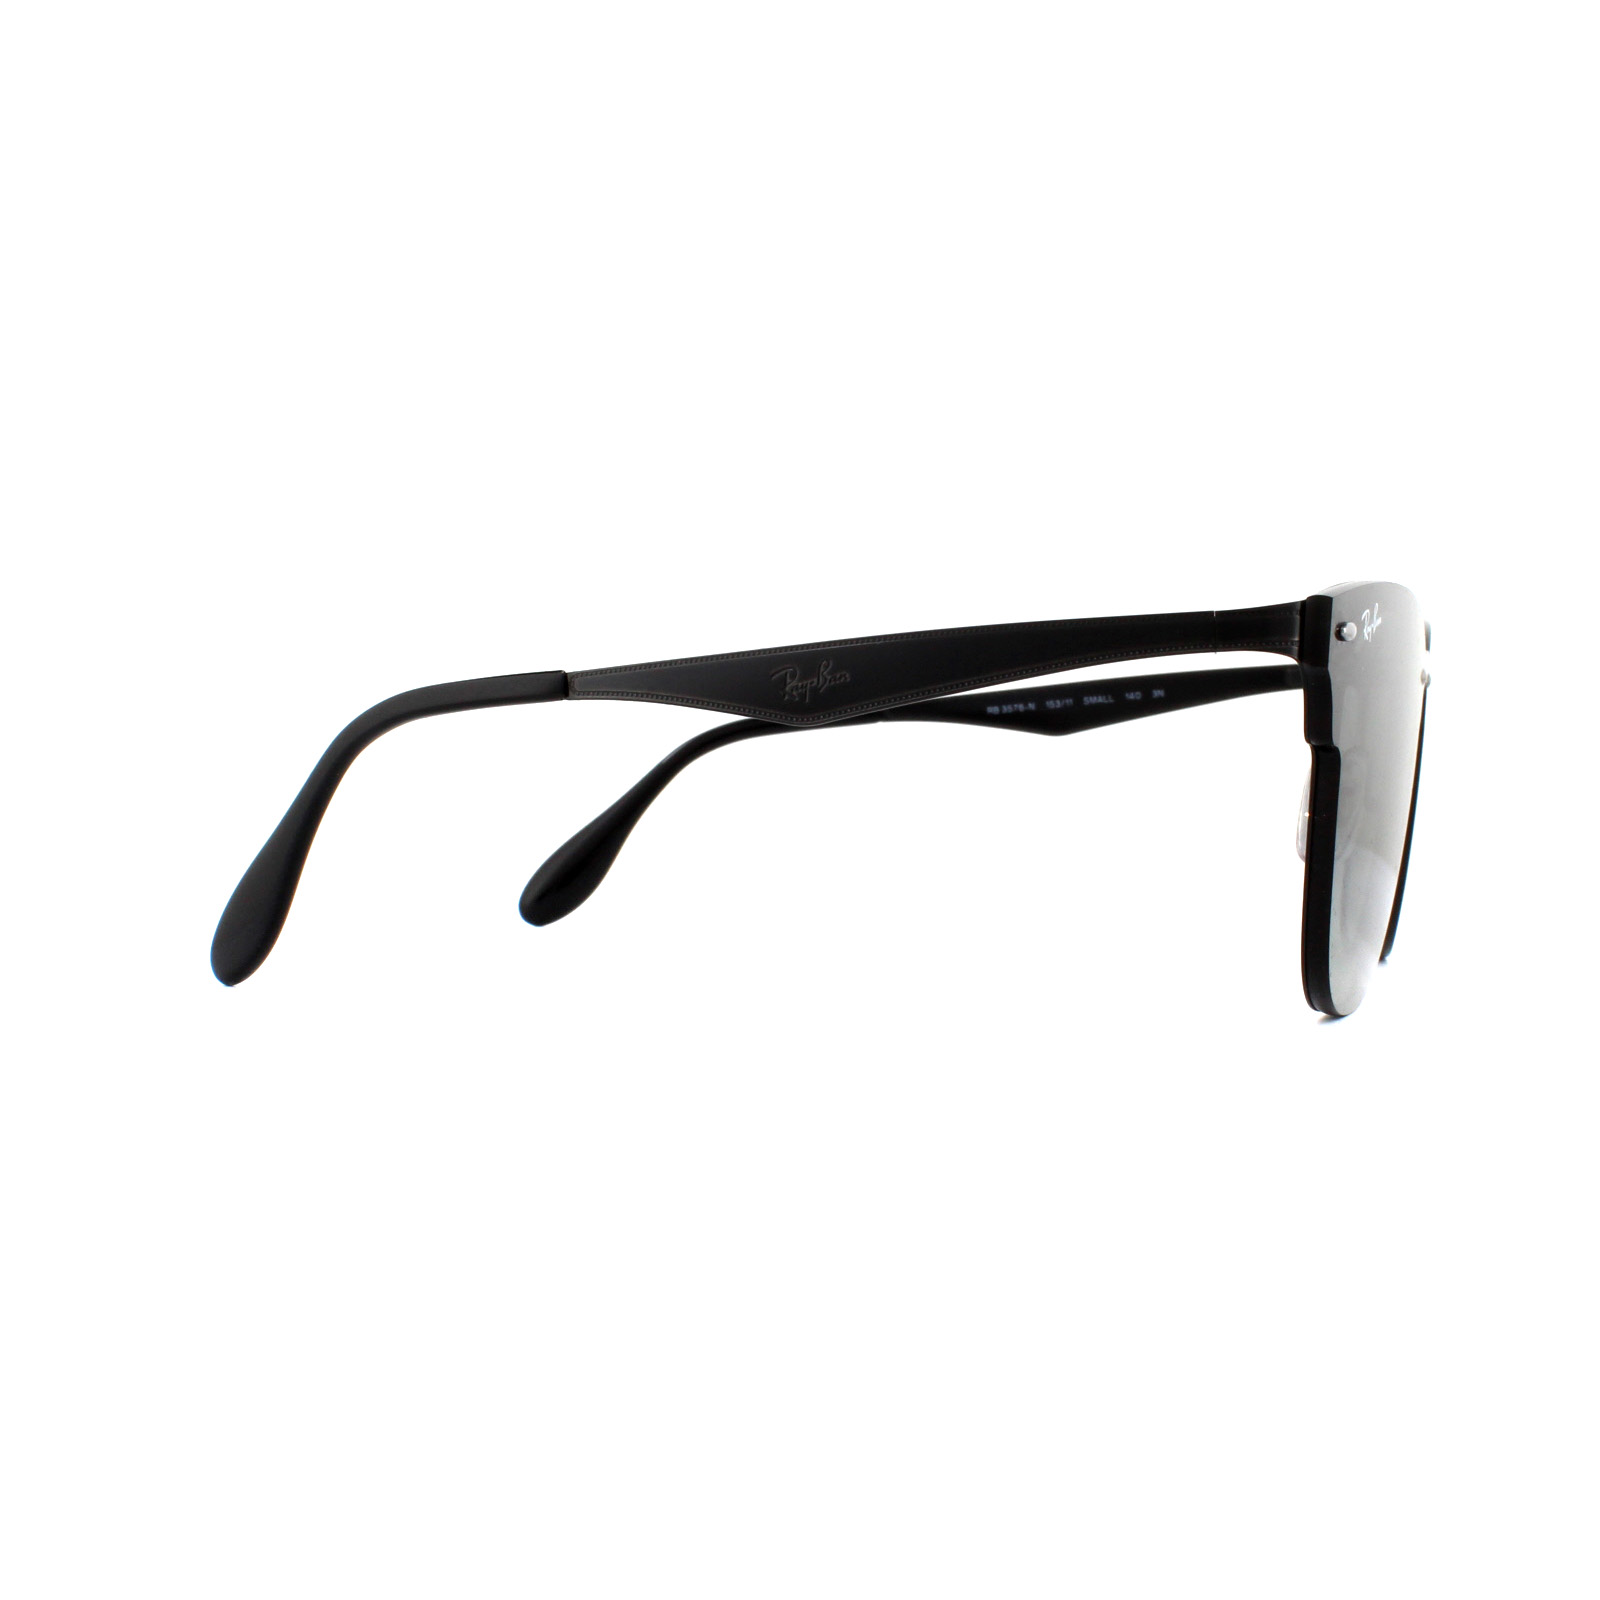 e2170ba31d Sentinel Ray-Ban Sunglasses Blaze Clubmaster 3576N 153 11 Demi Gloss Black  Gradient Grey